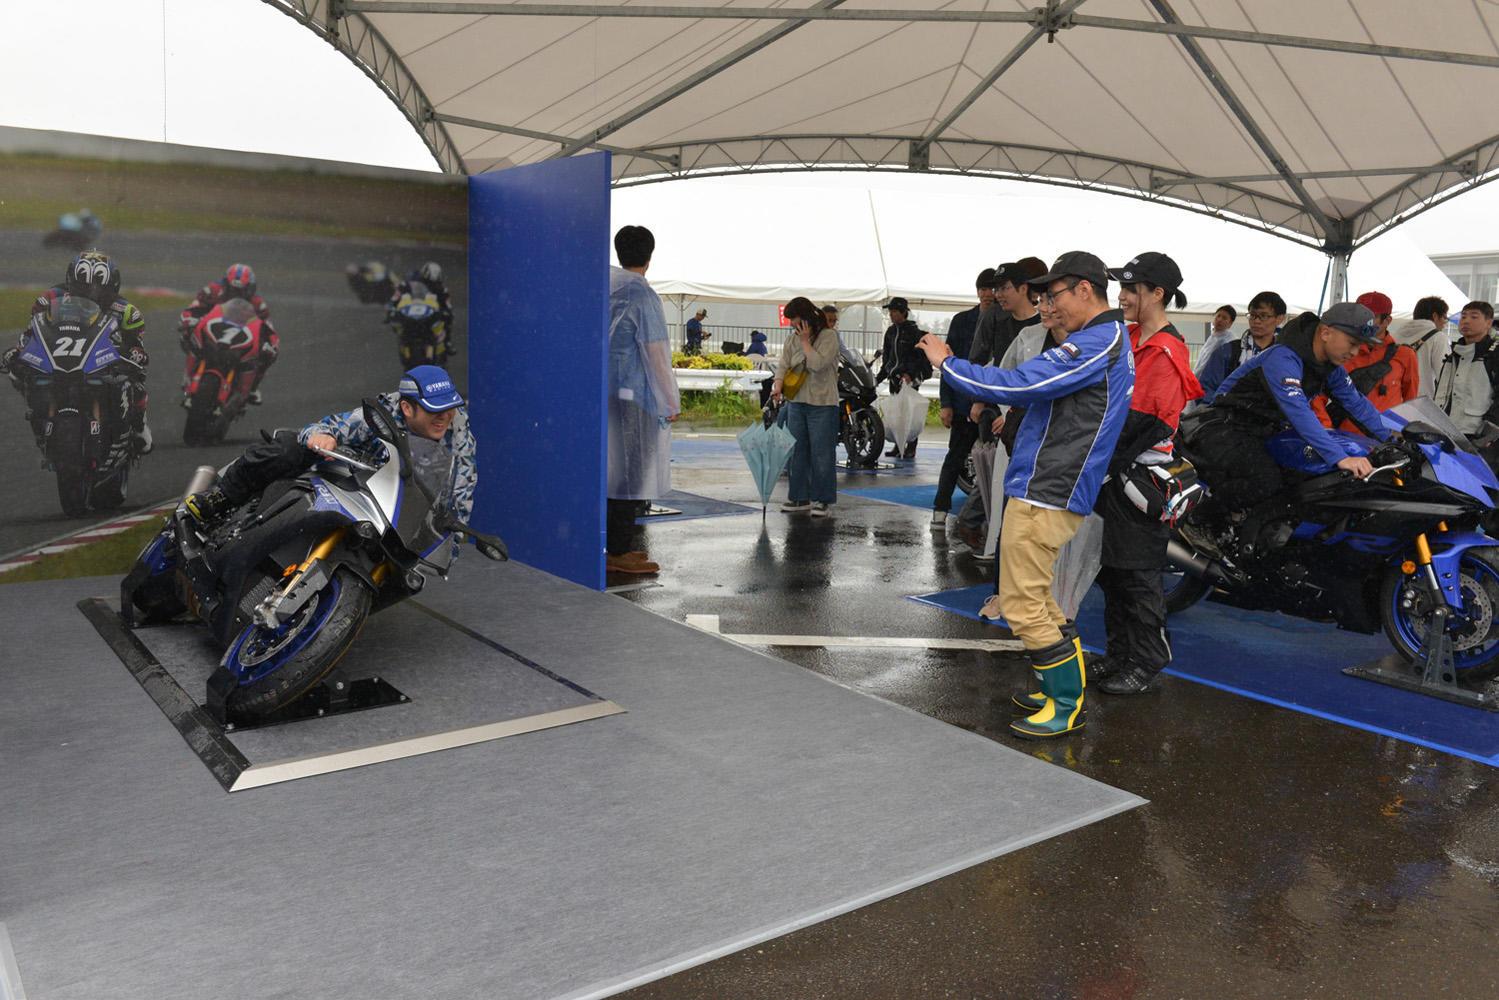 T-shirt moto YZF R6 racing team biker